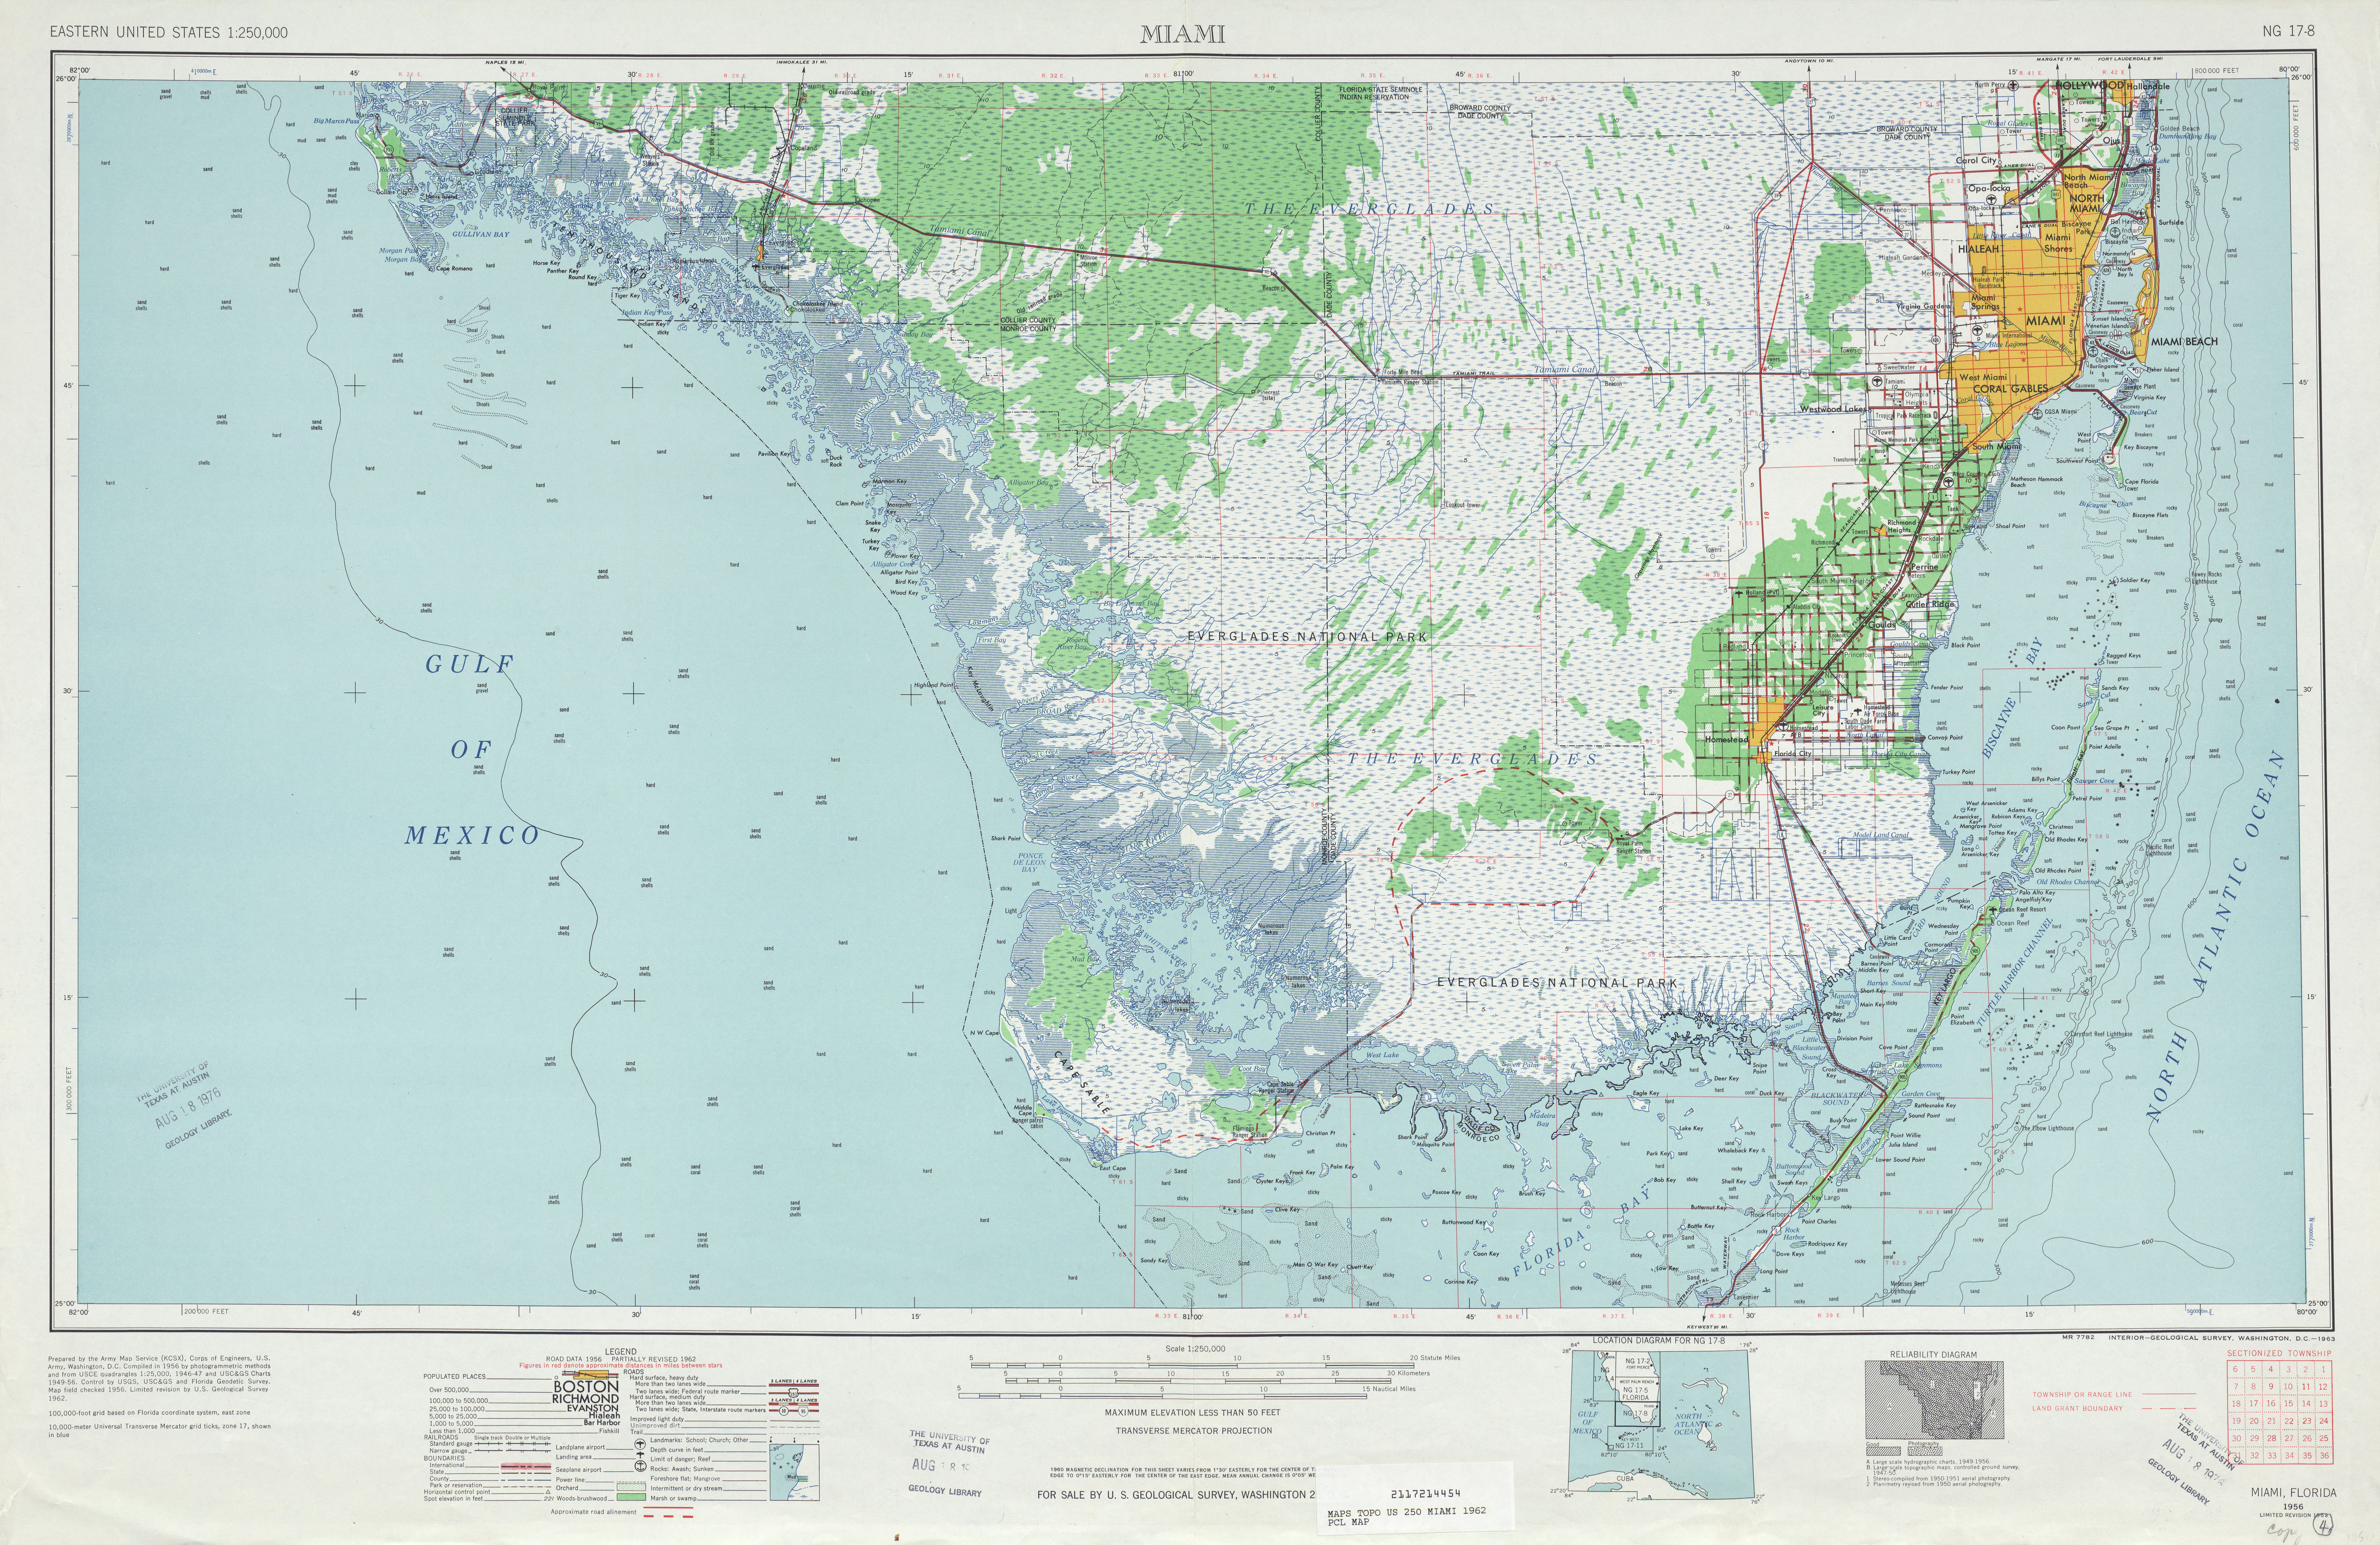 Miami Topographic Map Sheet, United States 1962